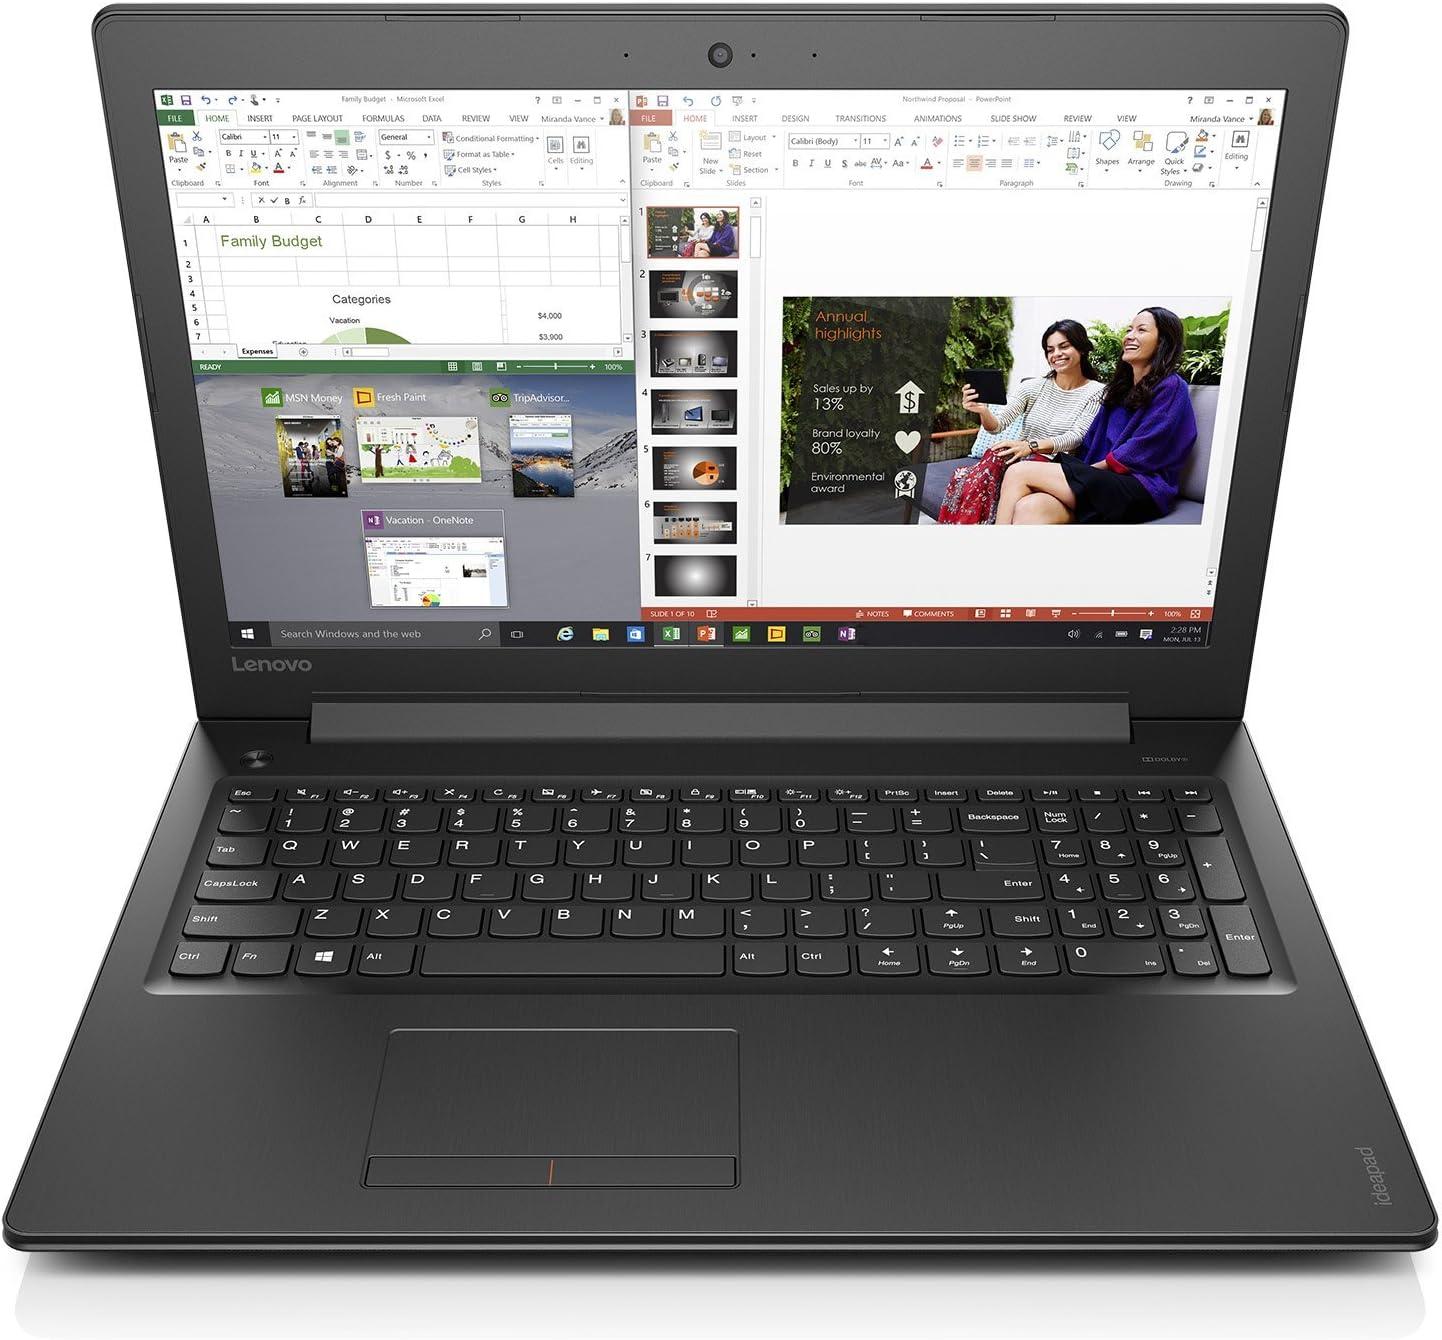 "Lenovo Ideapad 310 - 15.6"" HD Display Laptop with 3x Faster WiFi (Intel Core i5-6200U, 8 GB RAM, 1TB HDD, Windows 10) 80SM0058US"